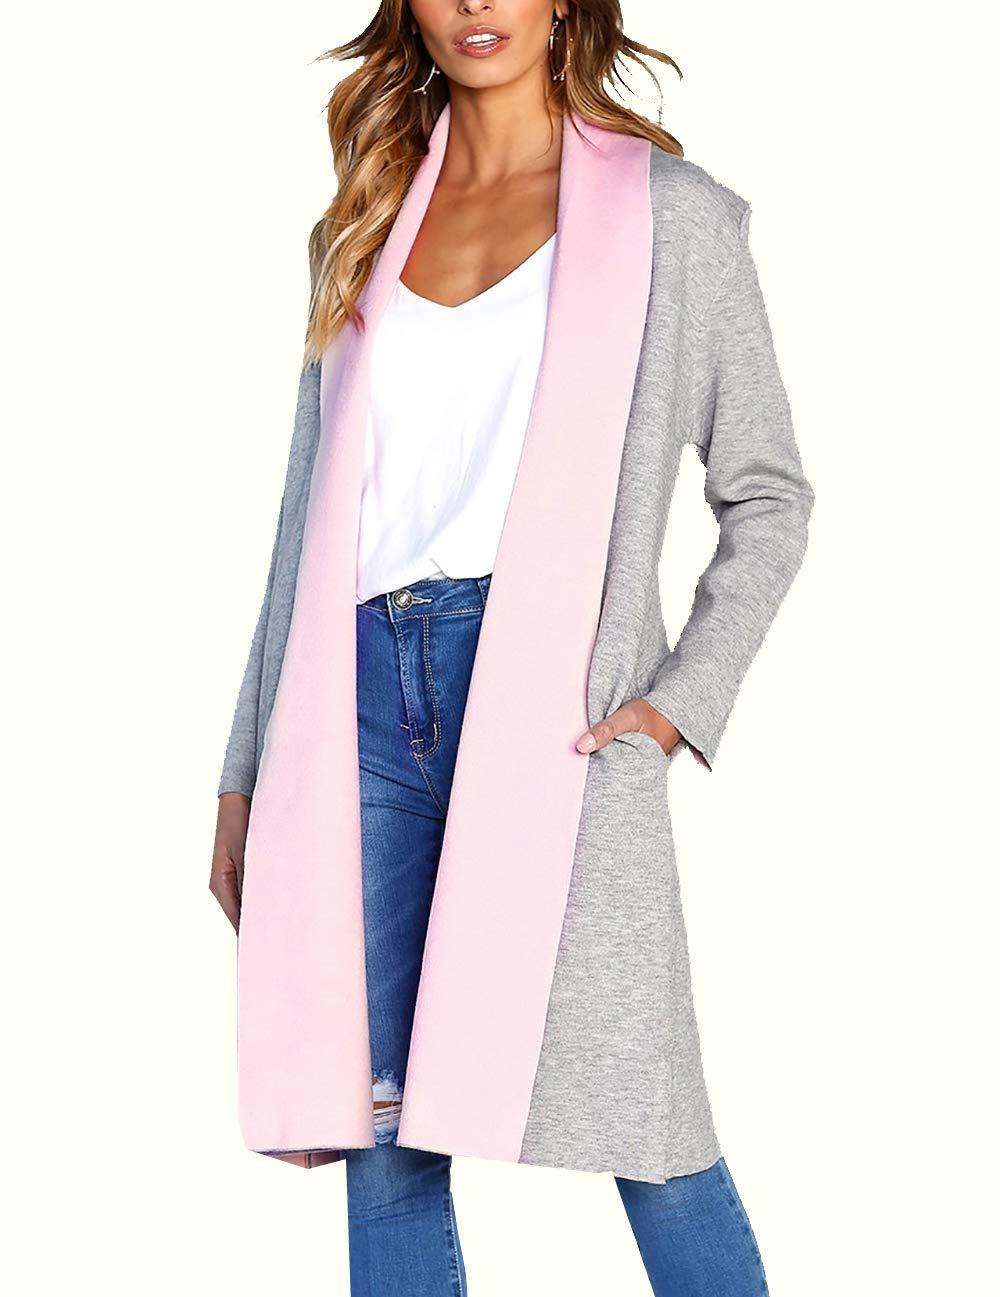 PRETTYGARDEN Women's Long Sleeve Shawl Collar Draped Open Front Long Cardigan Thick Coat Outwear (Pink, Large)